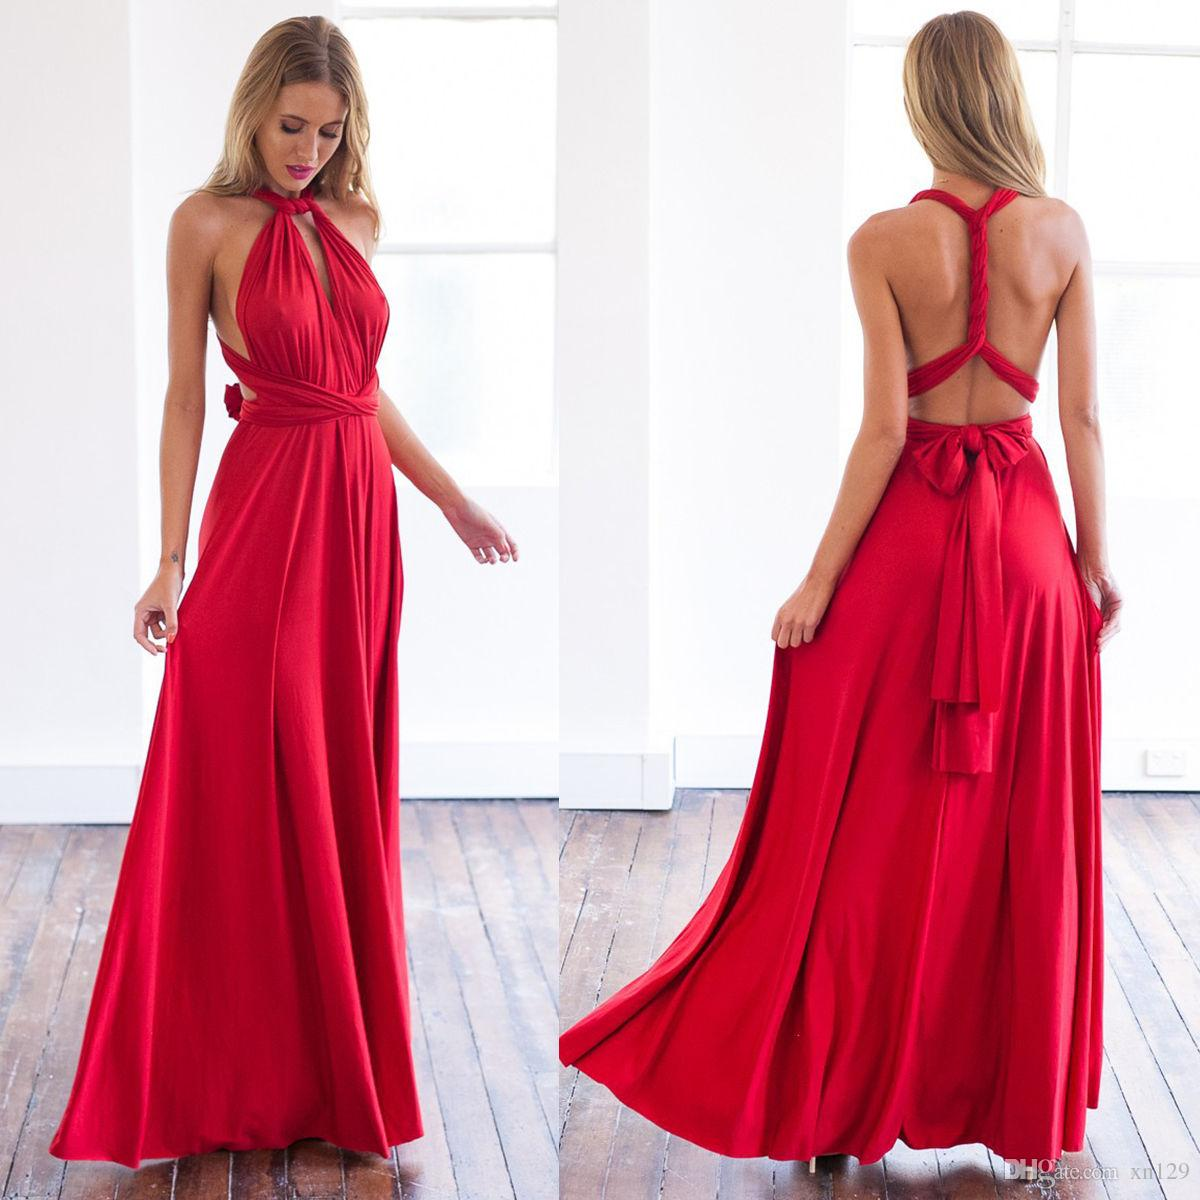 Vestidos longos formais da dama de honra do envoltório da maneira do Convertible do vestido de noite das multi vestidos das mulheres